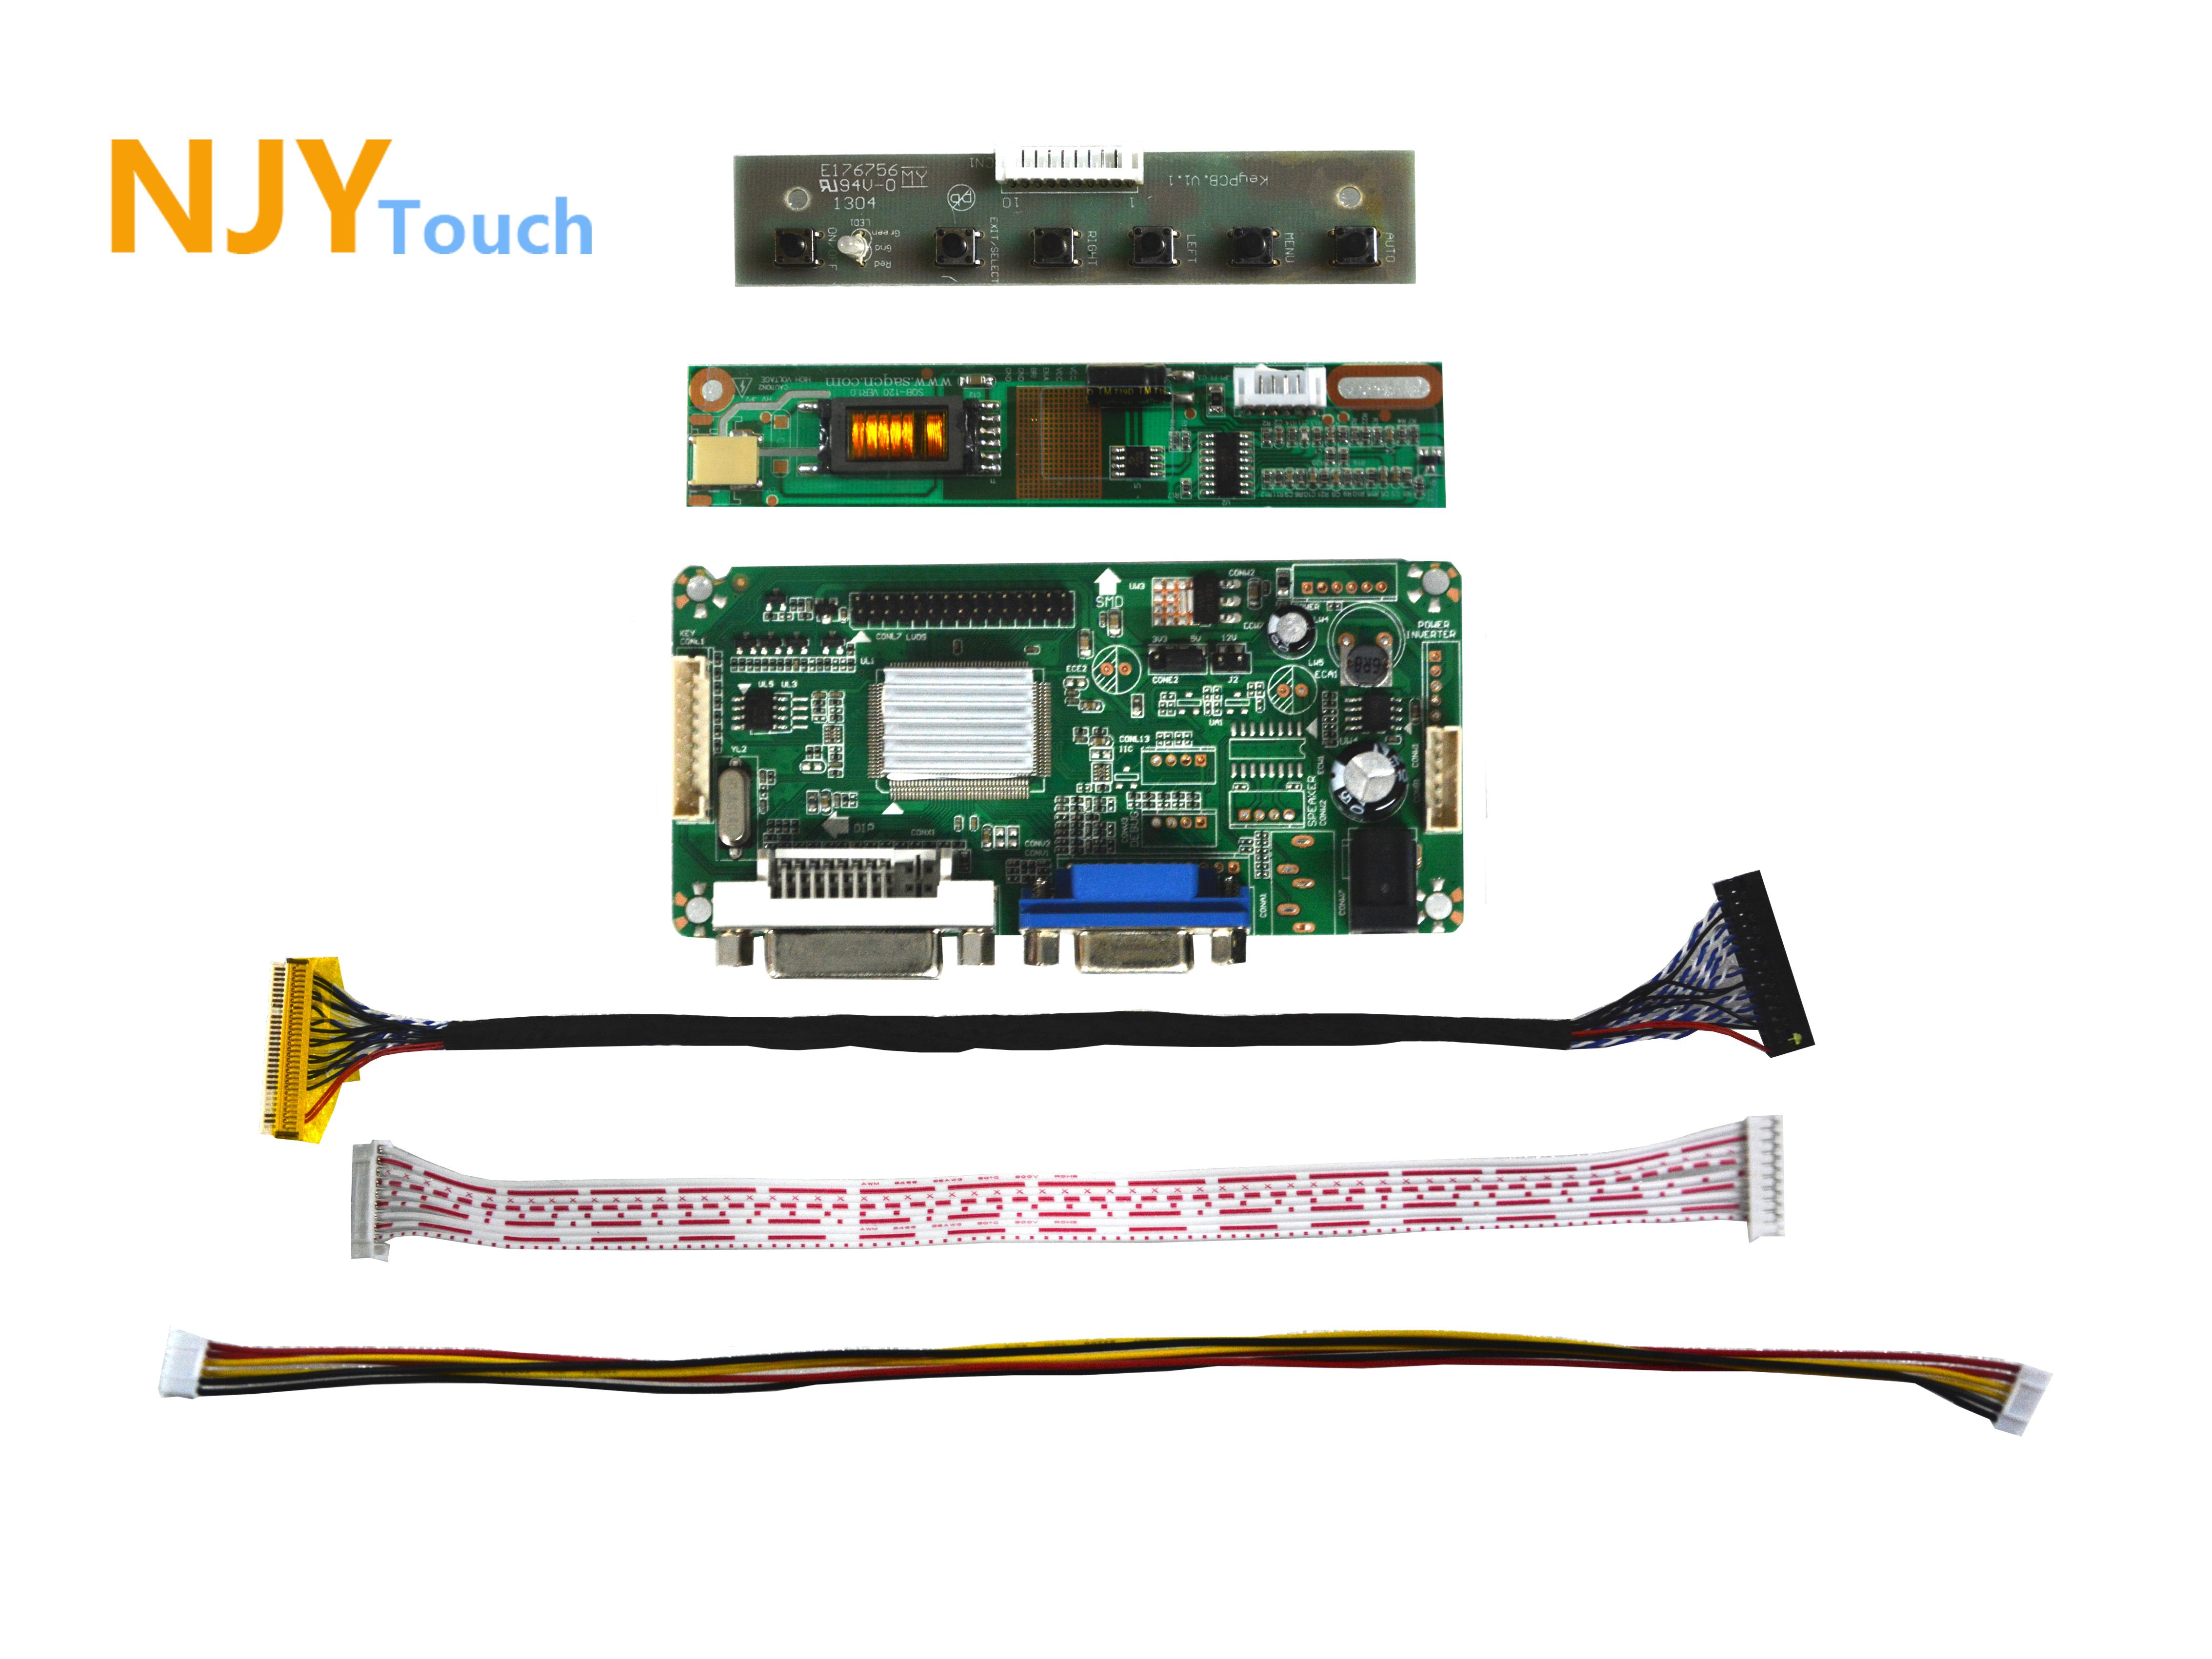 NJYTouch LM.R61 DVI VGA LCD Controller Driver Board For 17inch QD17TL02 LTN170WX-L05 1440x900 LCD Screen